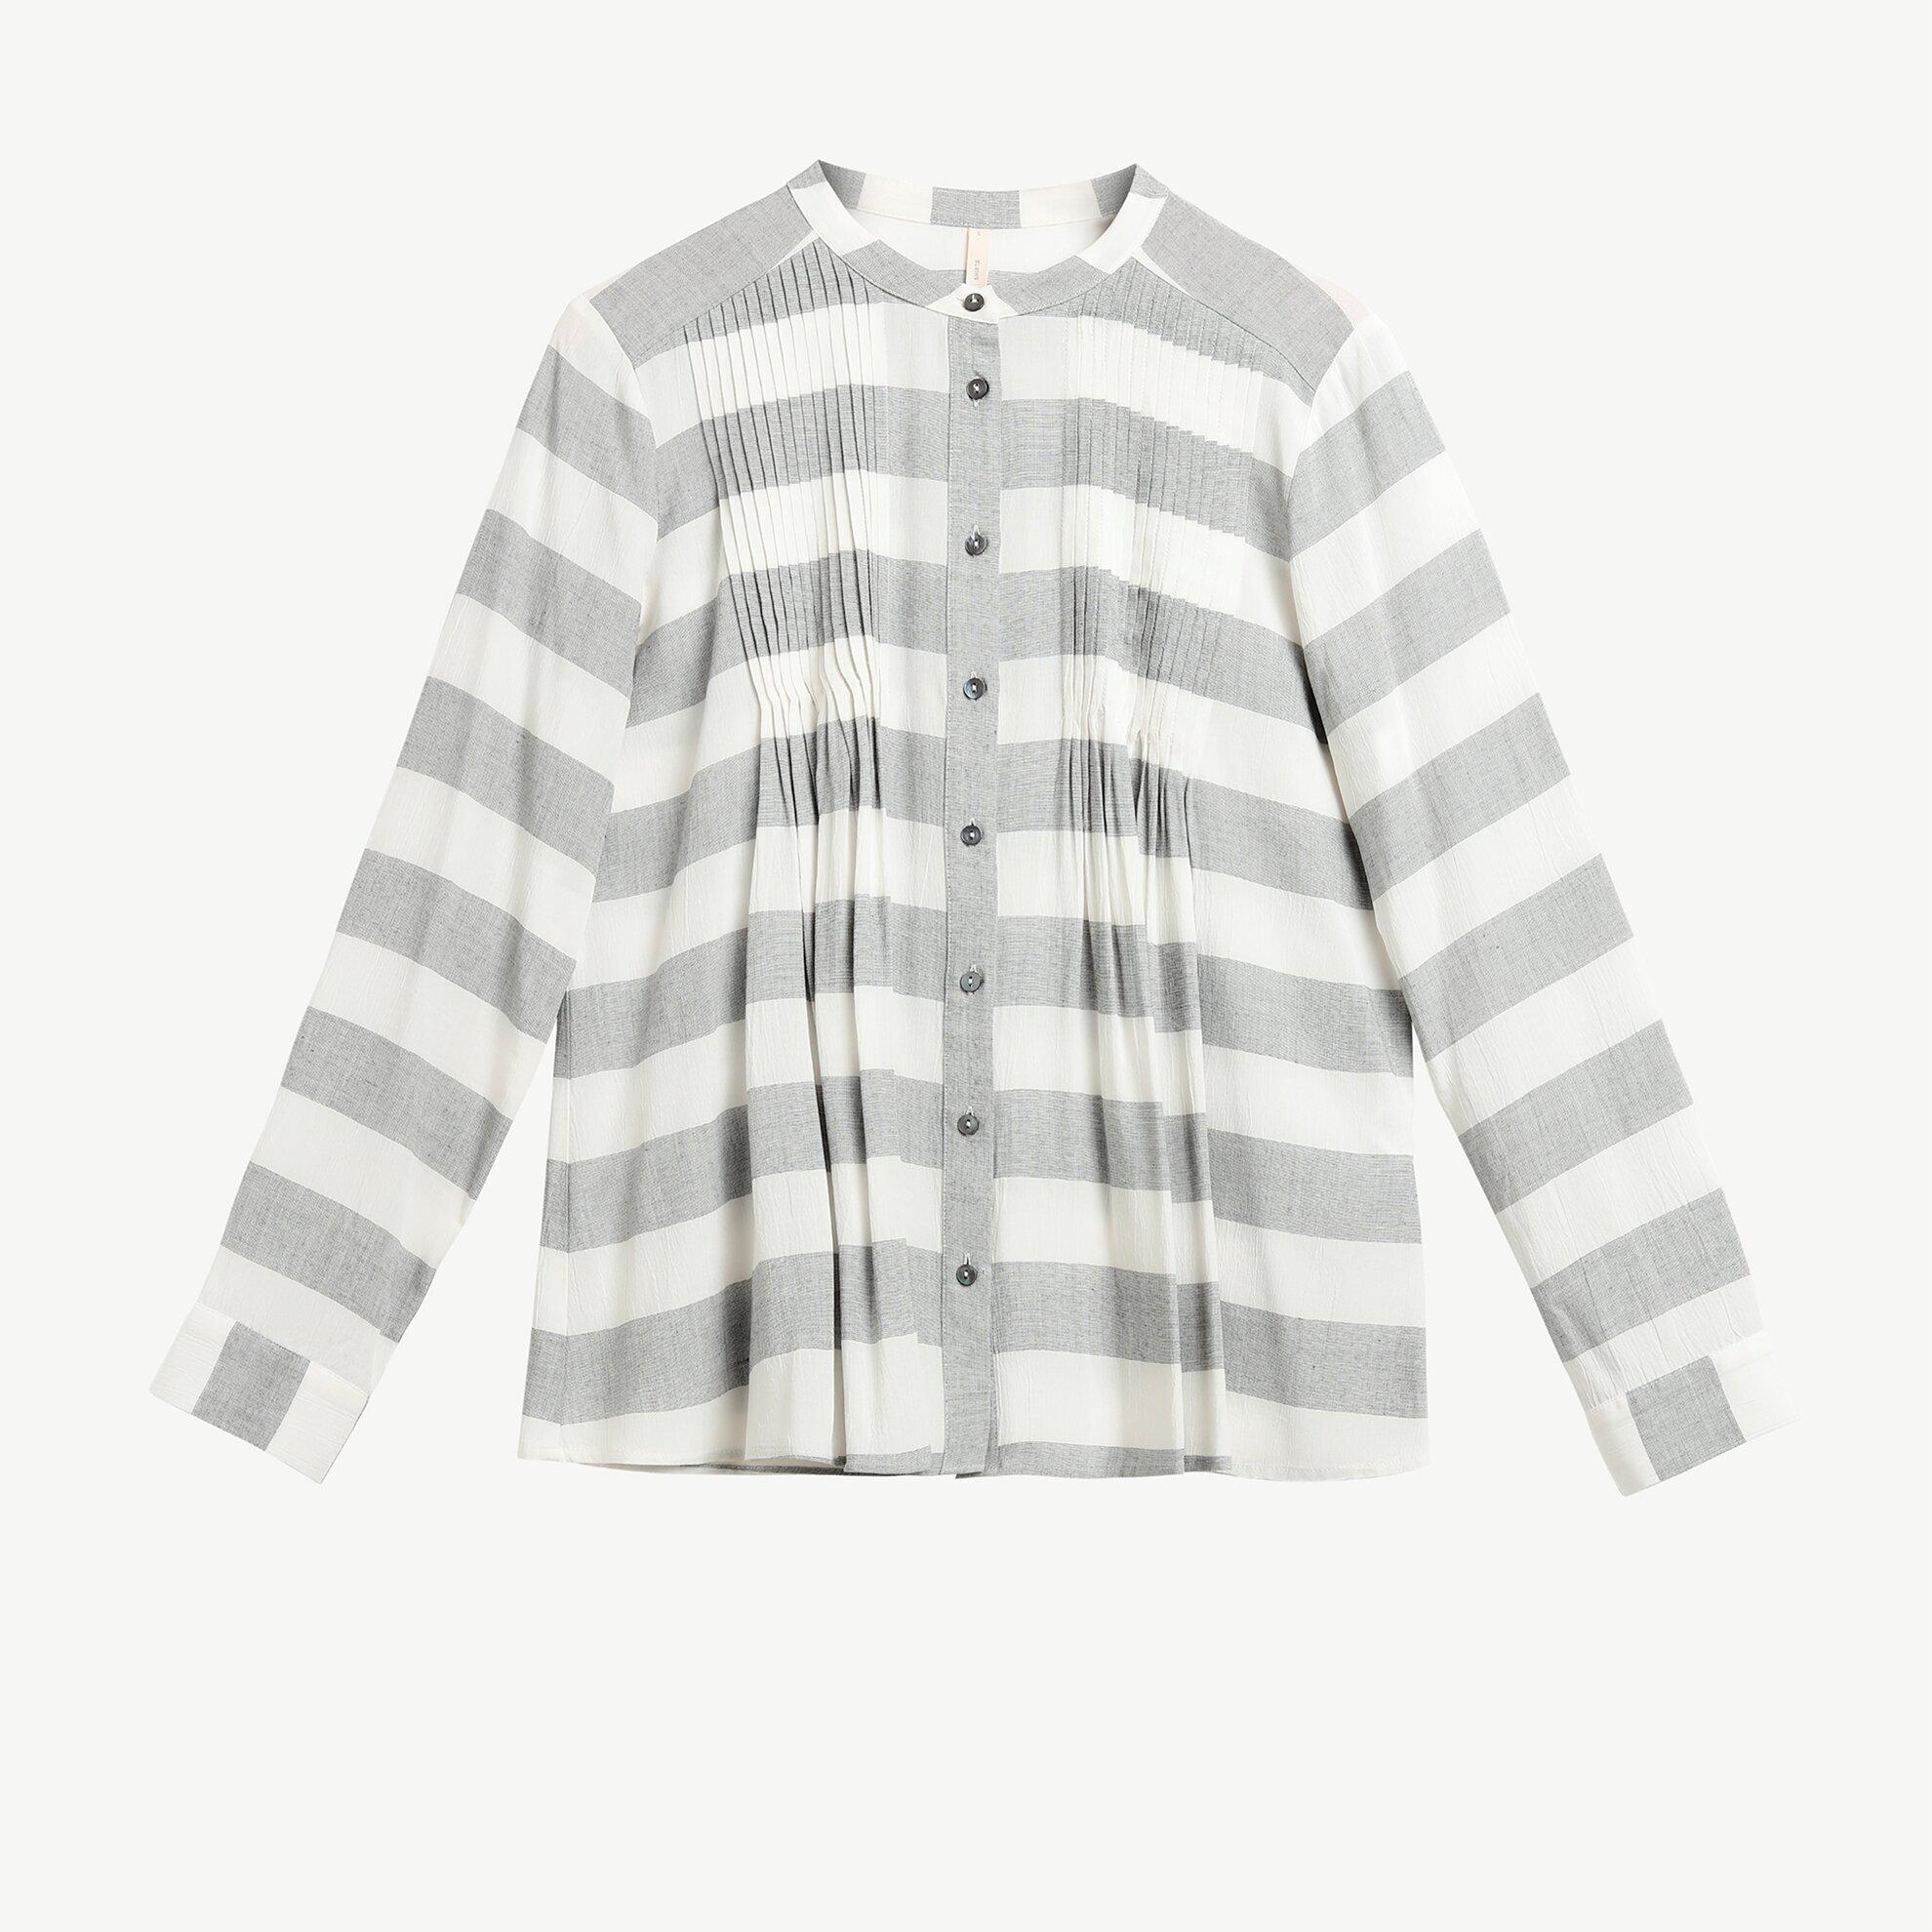 Pleat Detail Shirt